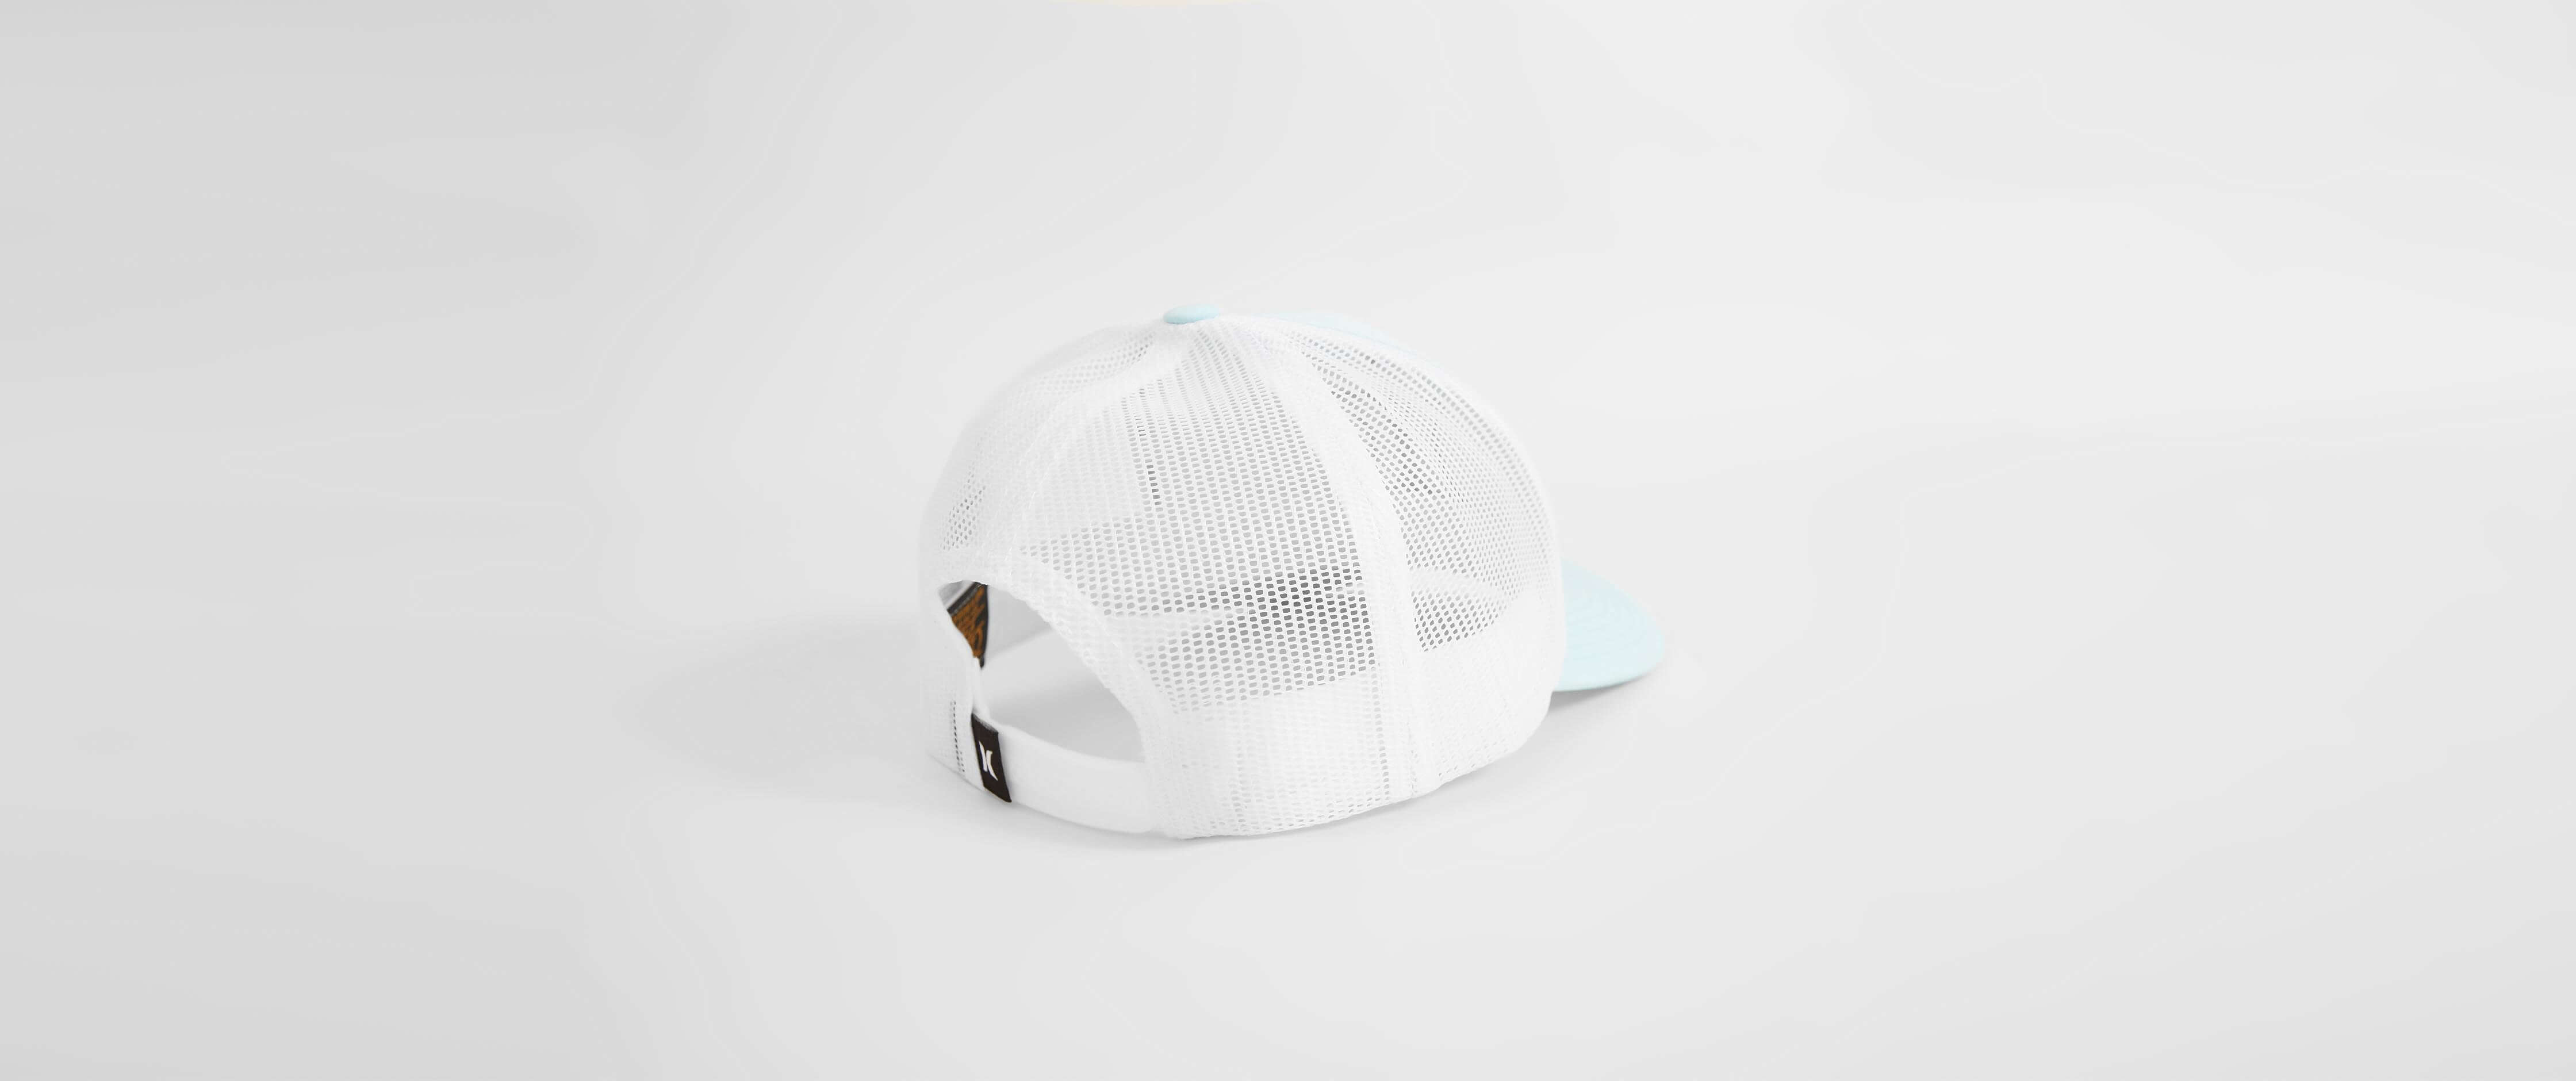 hurley phantom harbor trucker hat men s hats in ice cube blue buckle 1880 Cowboy Hats favorite product